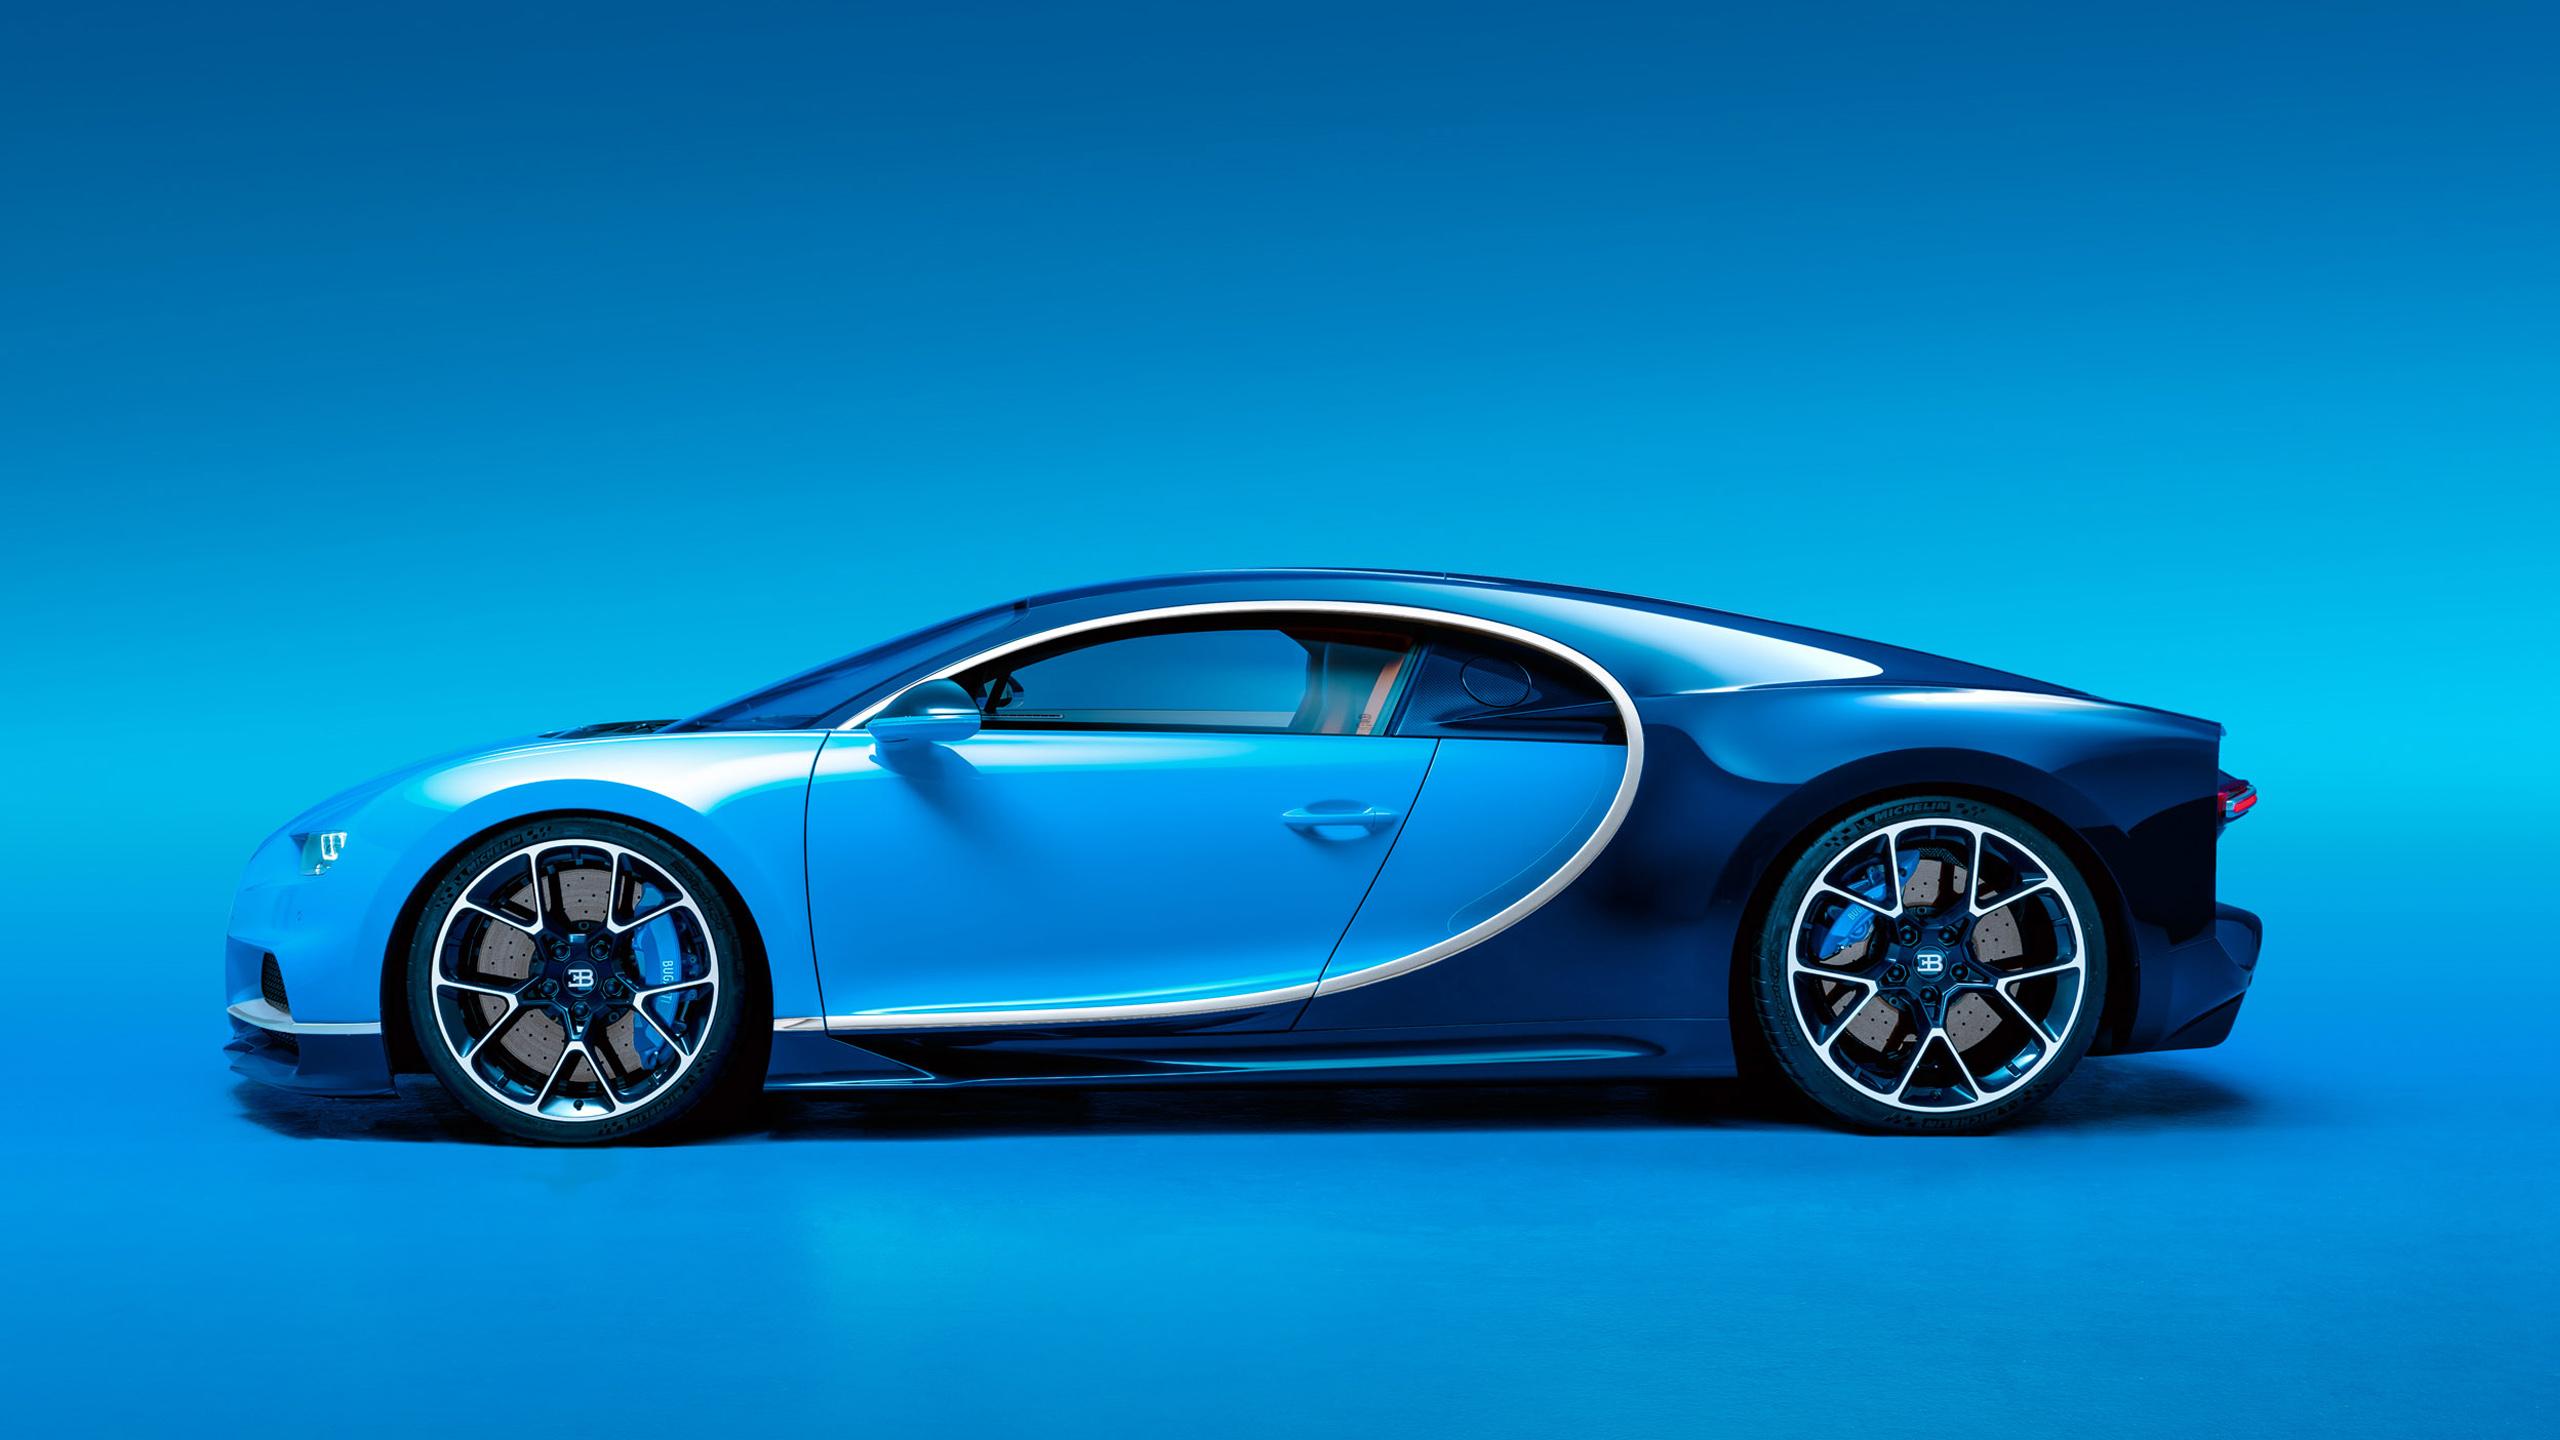 2016 Bugatti Chiron 2 Wallpaper Hd Car Wallpapers Id 6278